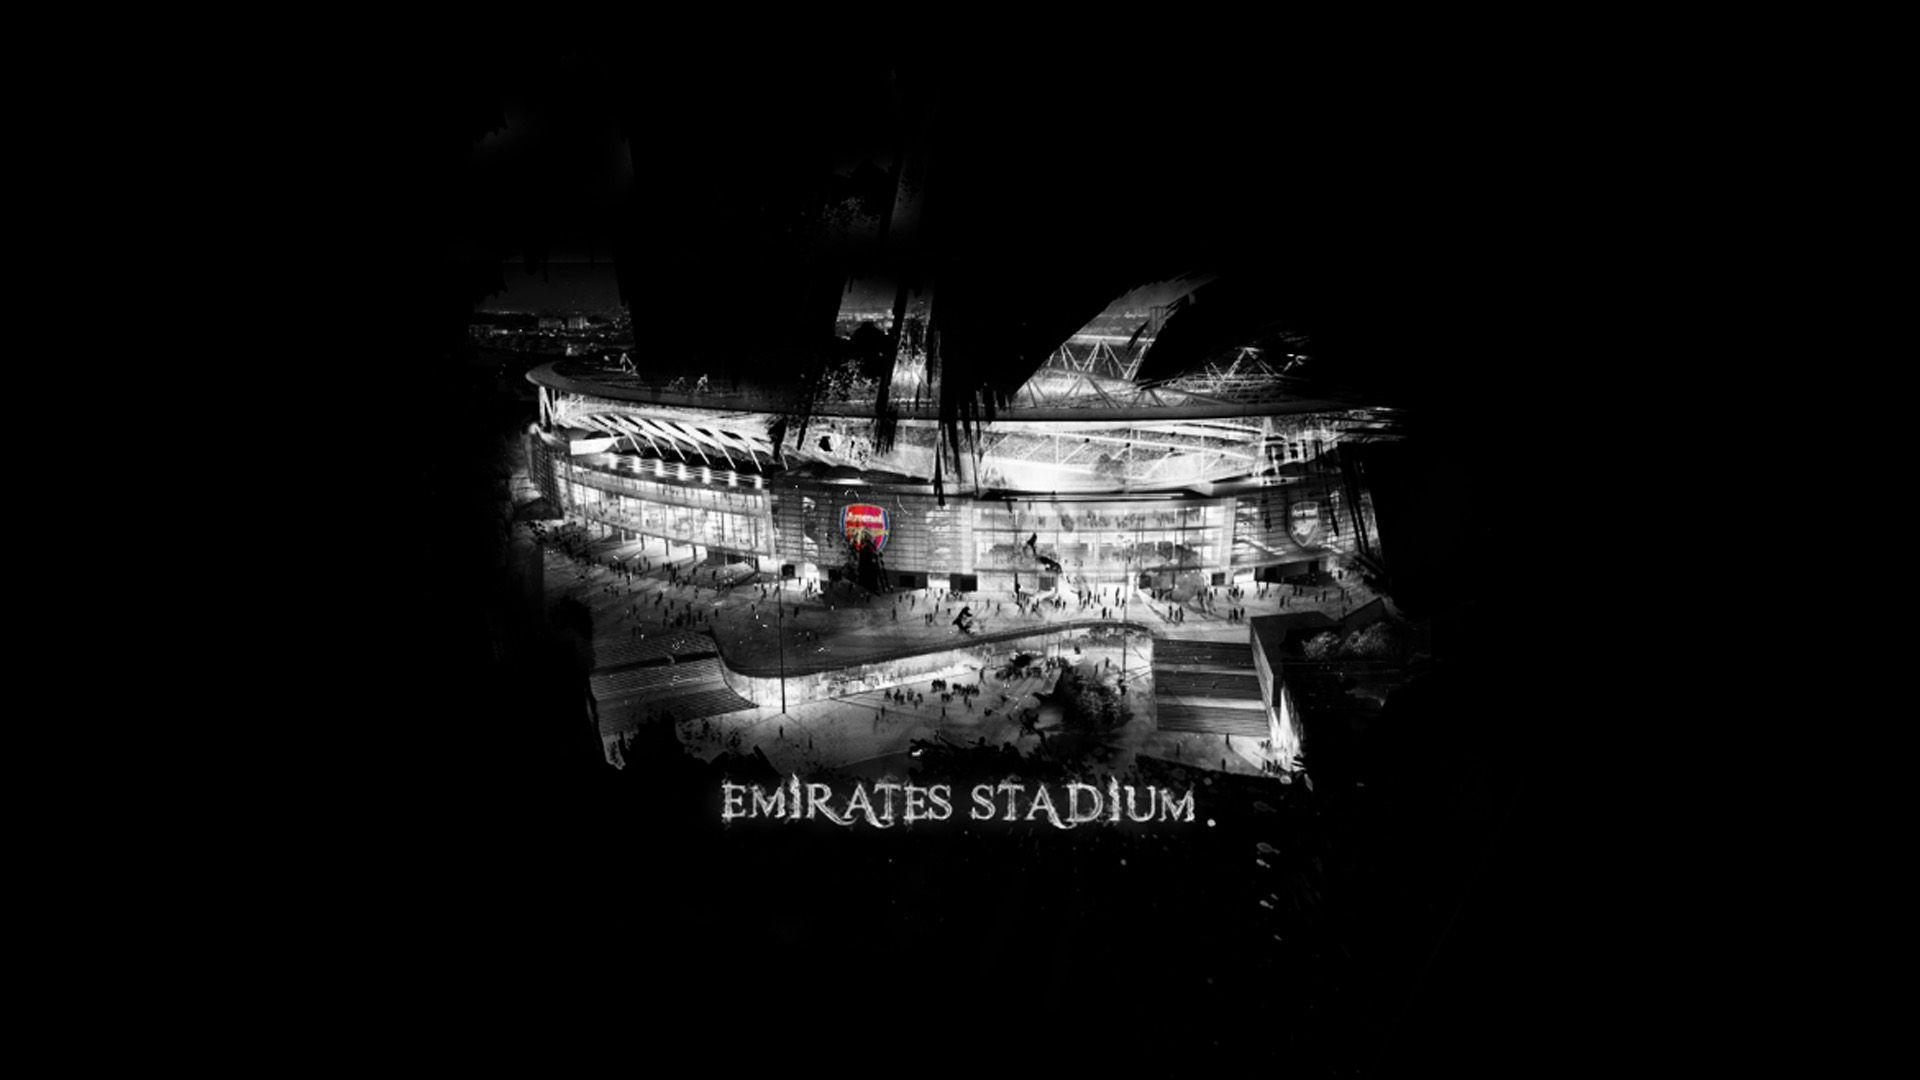 emirates stadium wallpapers wallpaper